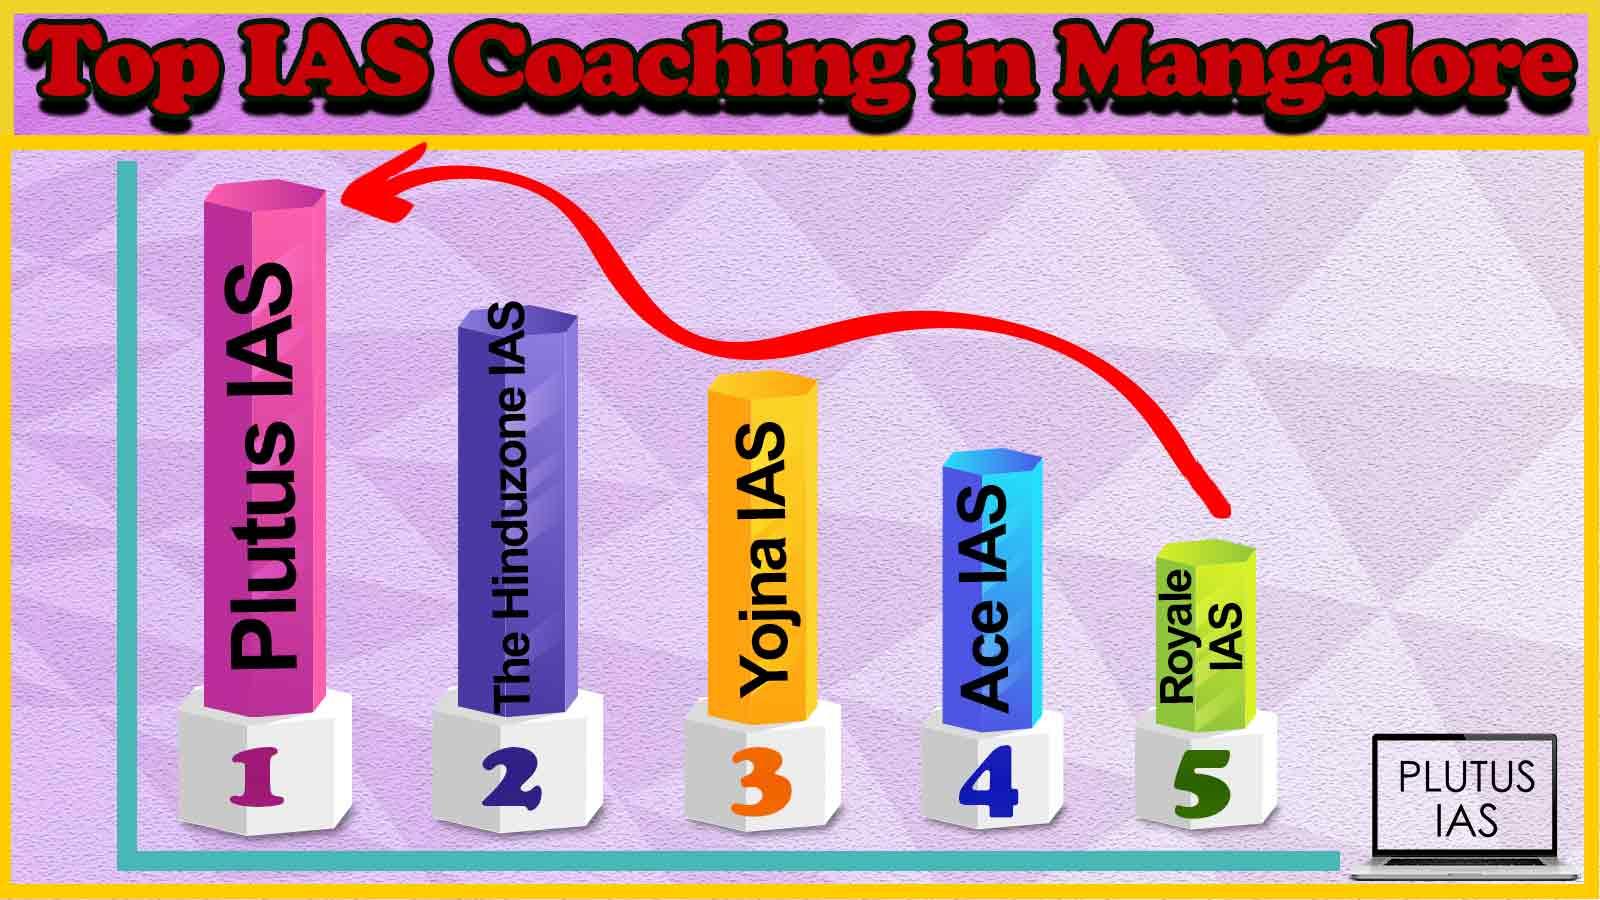 Best 10 IAS Coaching in Mangalore